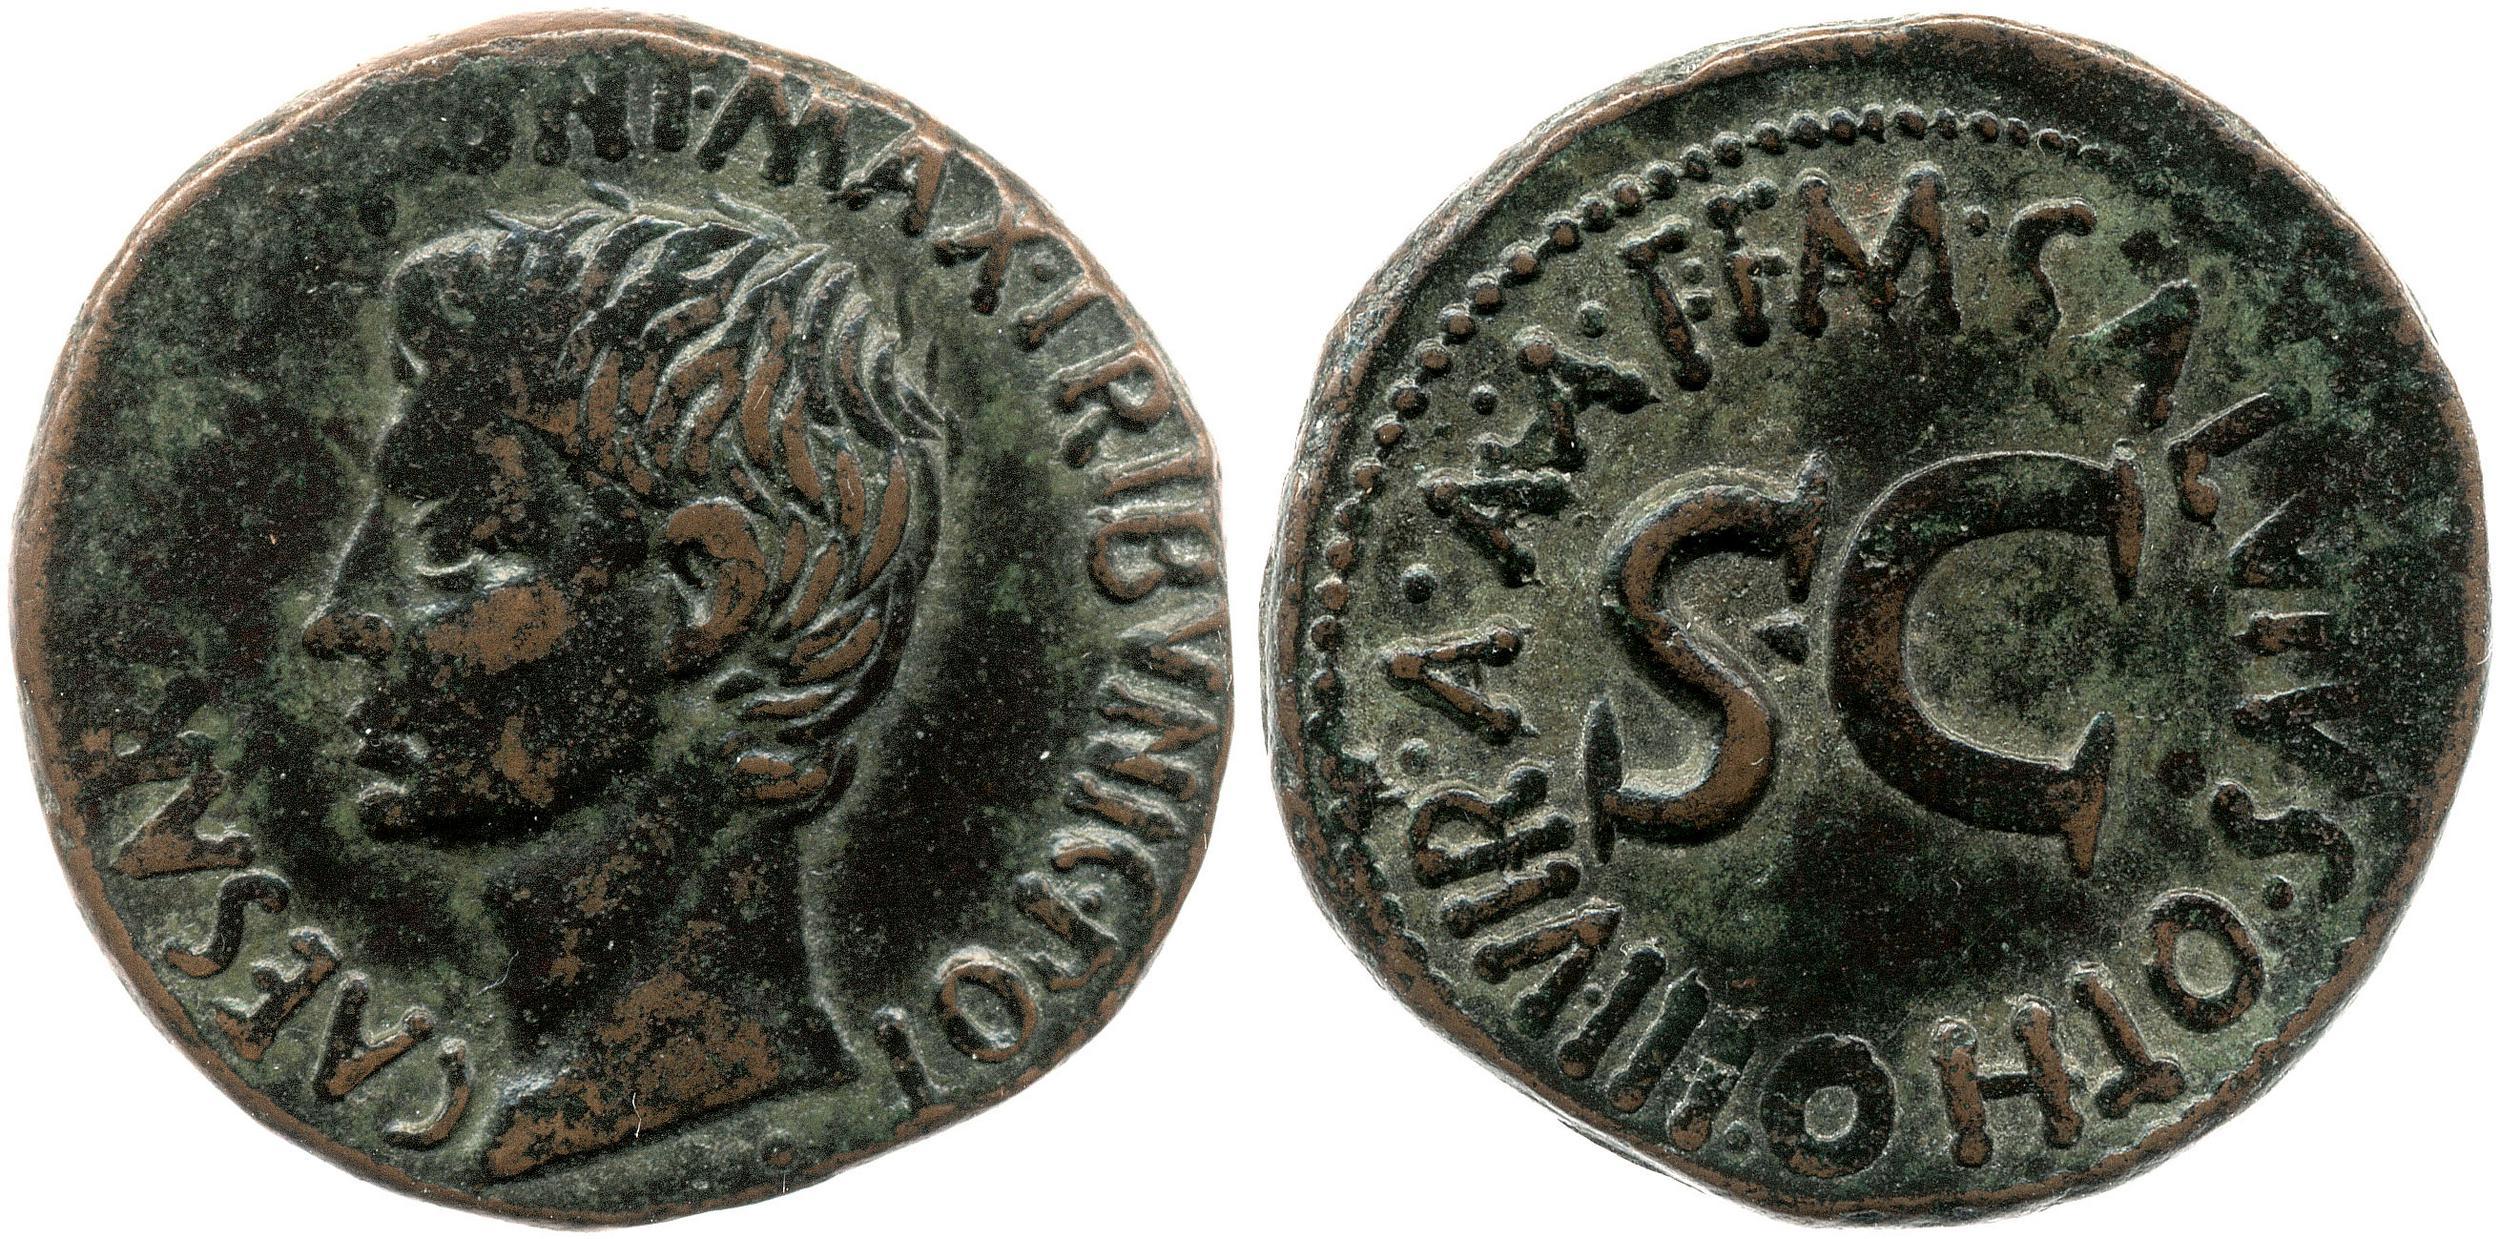 2169AU – As Auguste – M. Salvius Otho